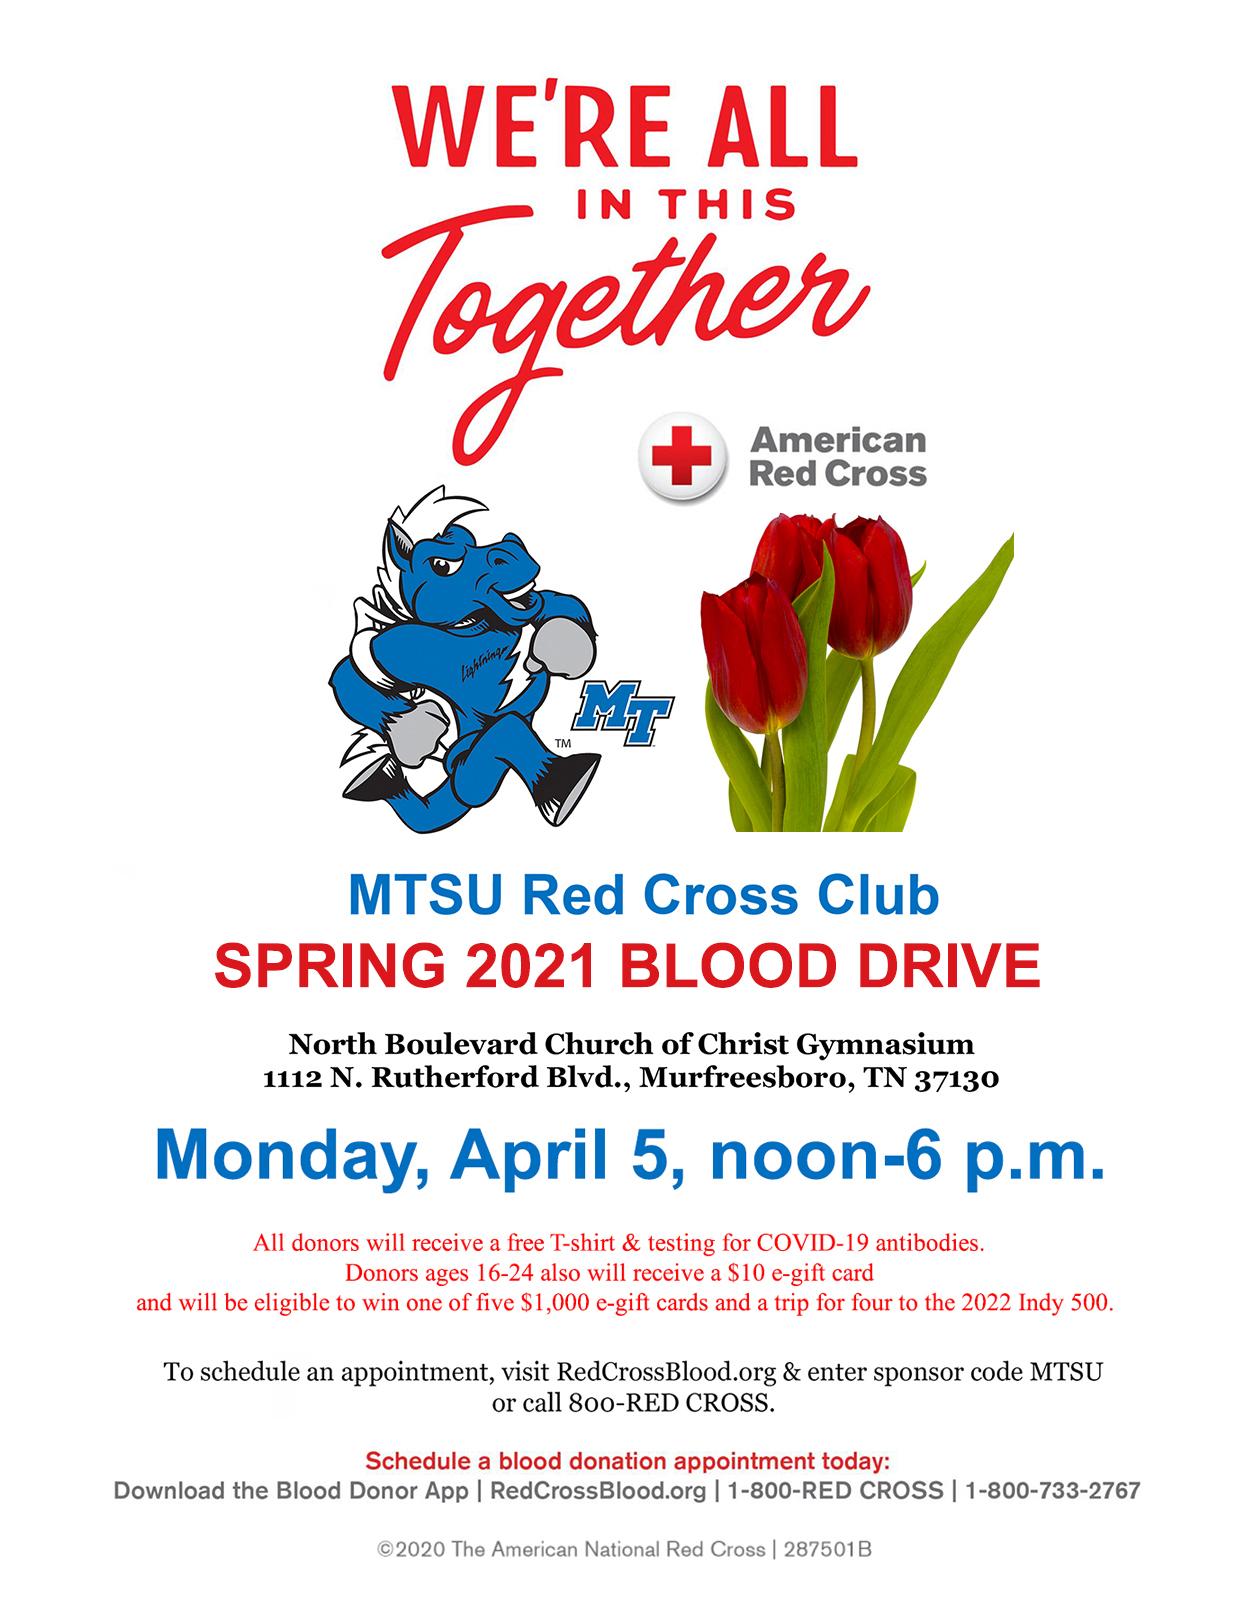 MTSU 2021 spring blood drive poster